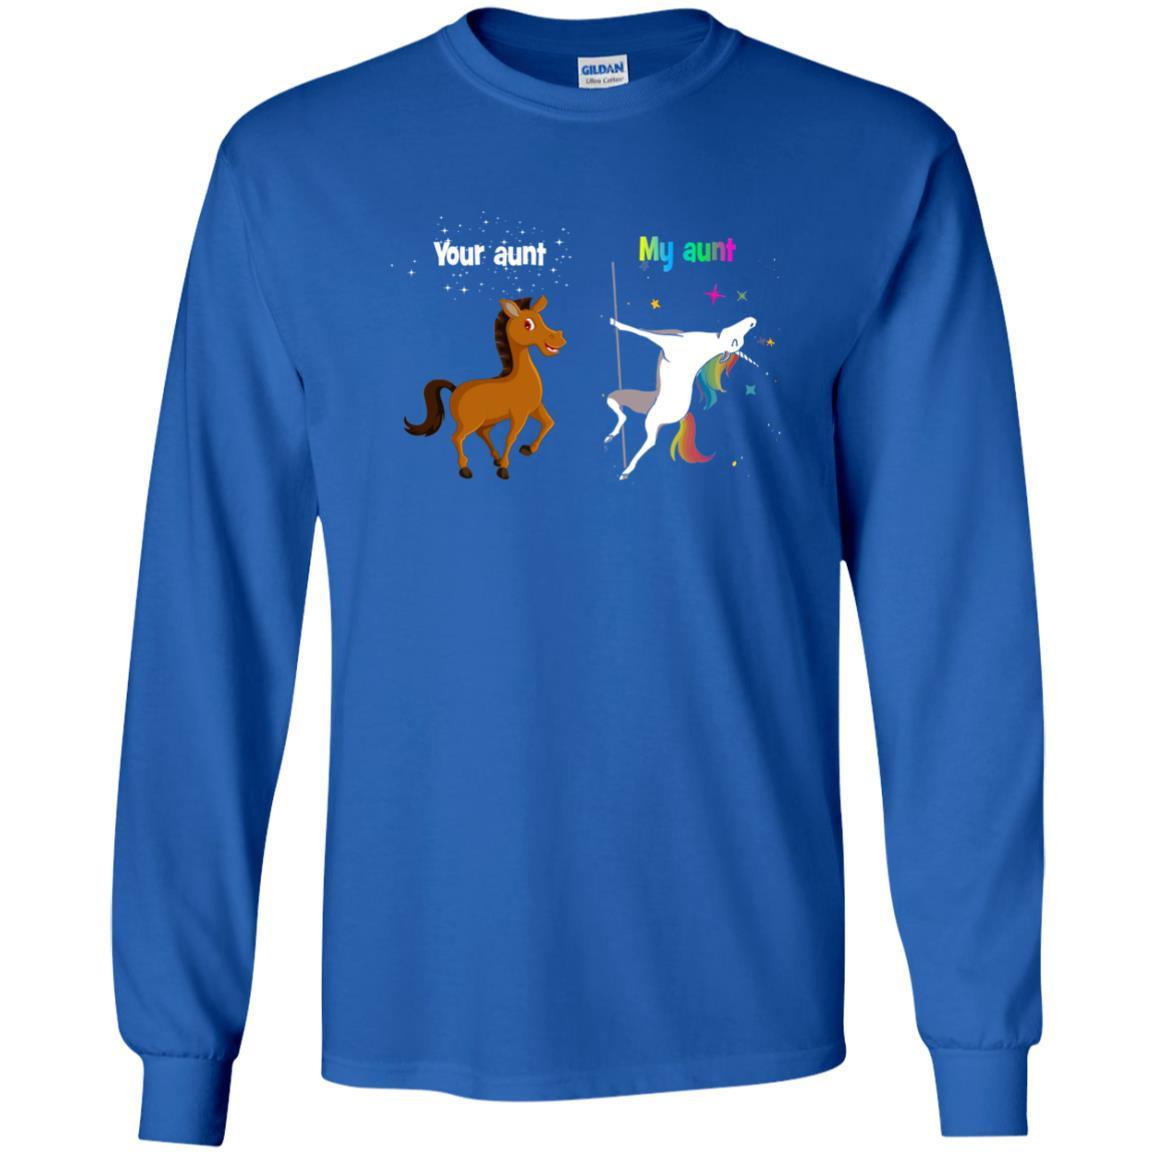 image 967px My aunt unicorn vs your aunt horse youth t shirt